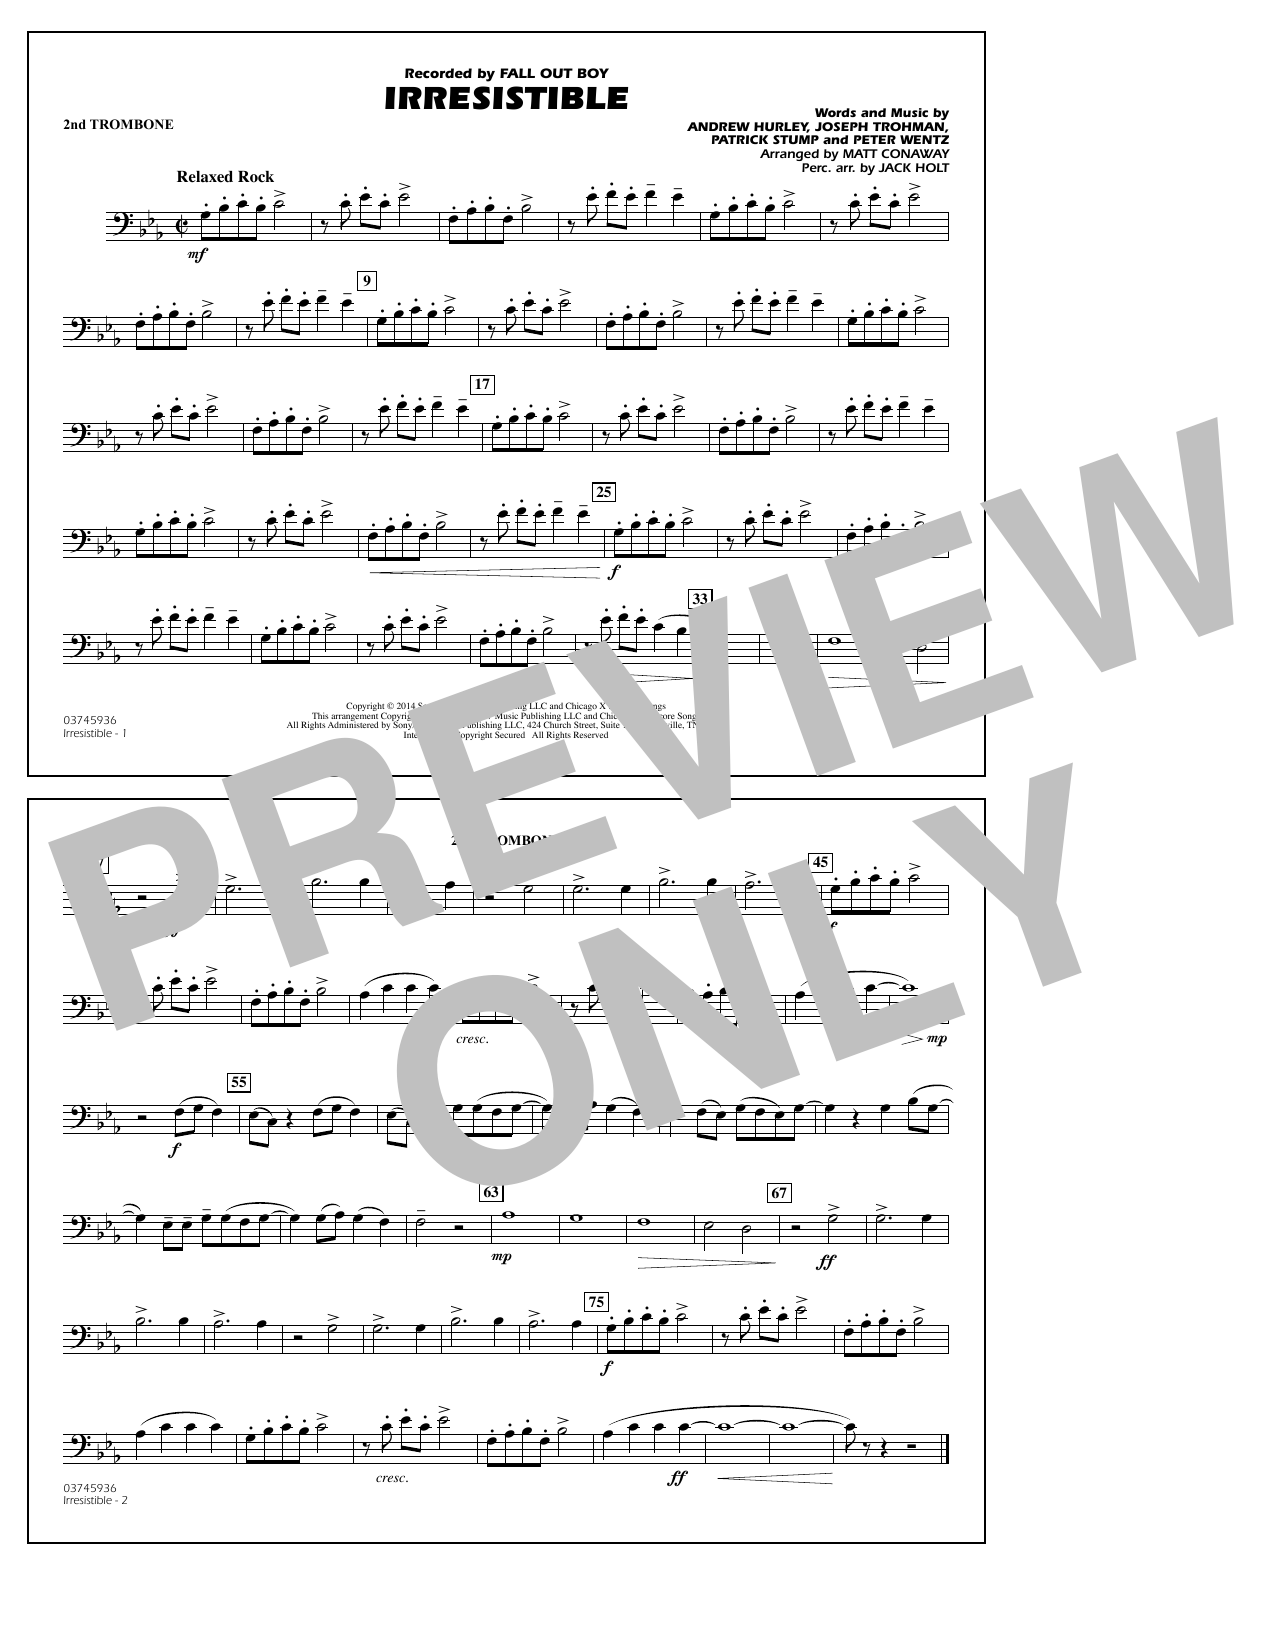 Irresistible - 2nd Trombone (Marching Band)